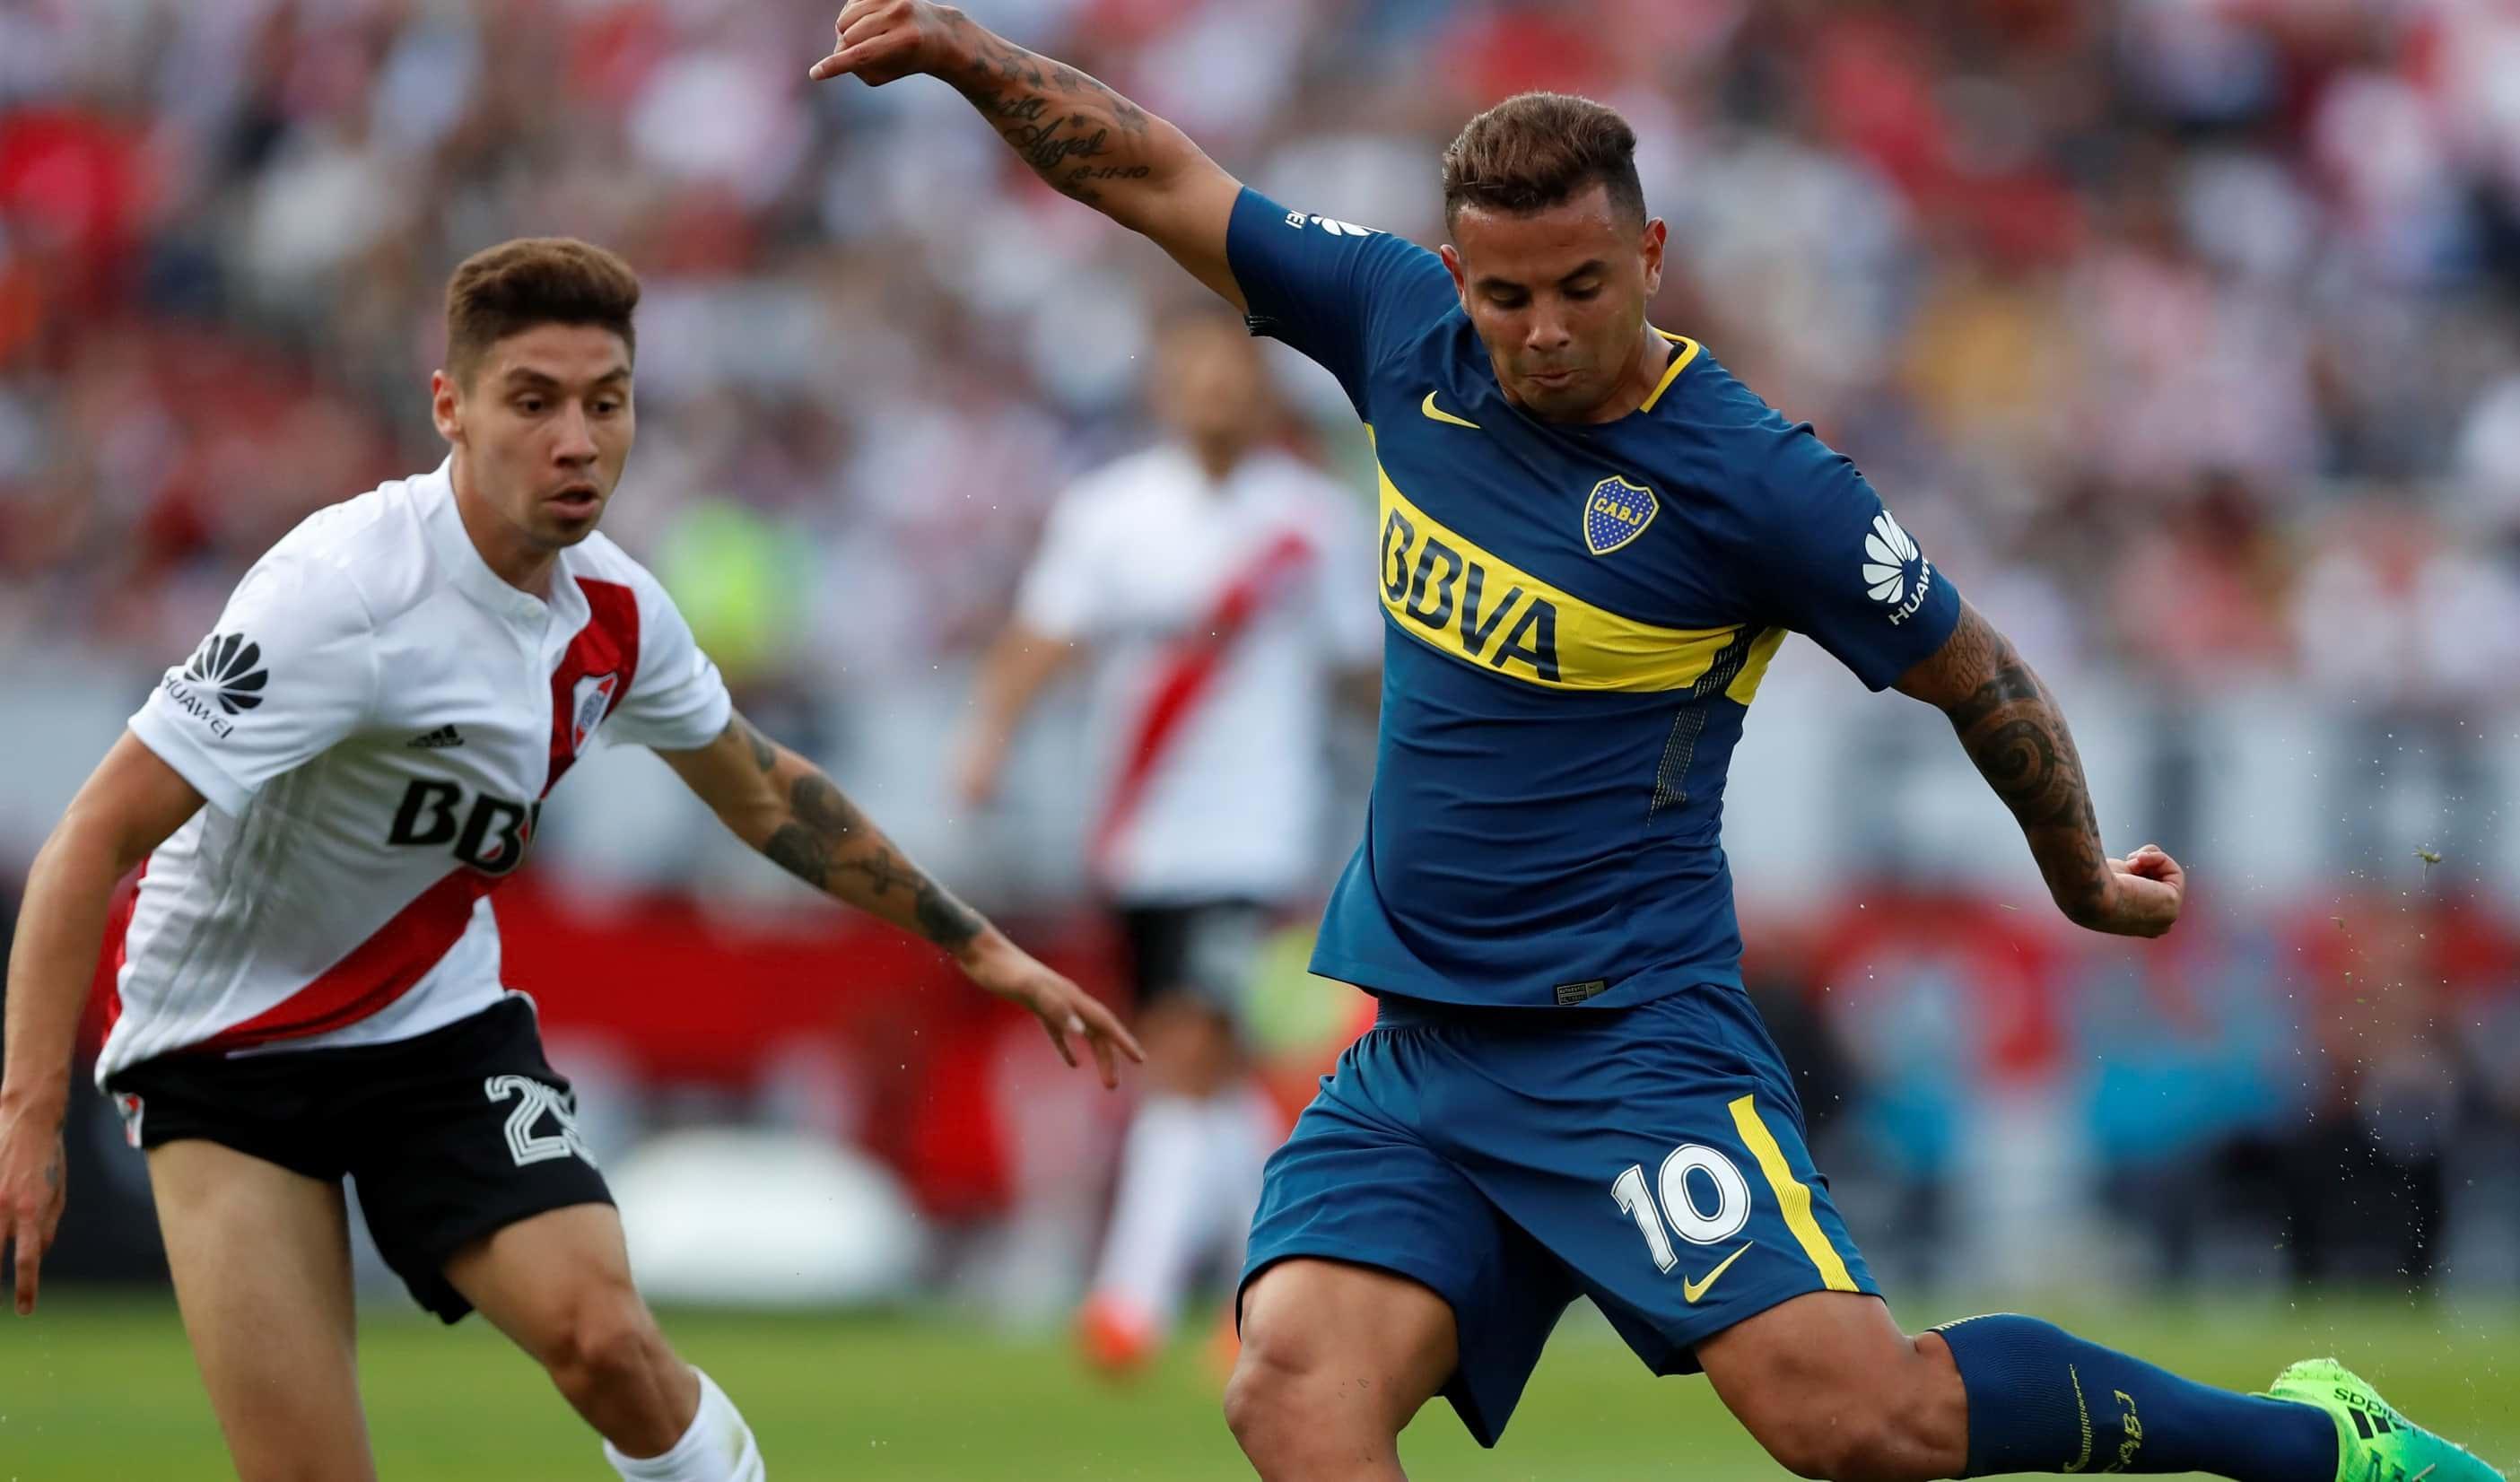 Estará en la suplencia de Edwin Cardona en Boca Juniors VS River Plate de Superliga 2018-19